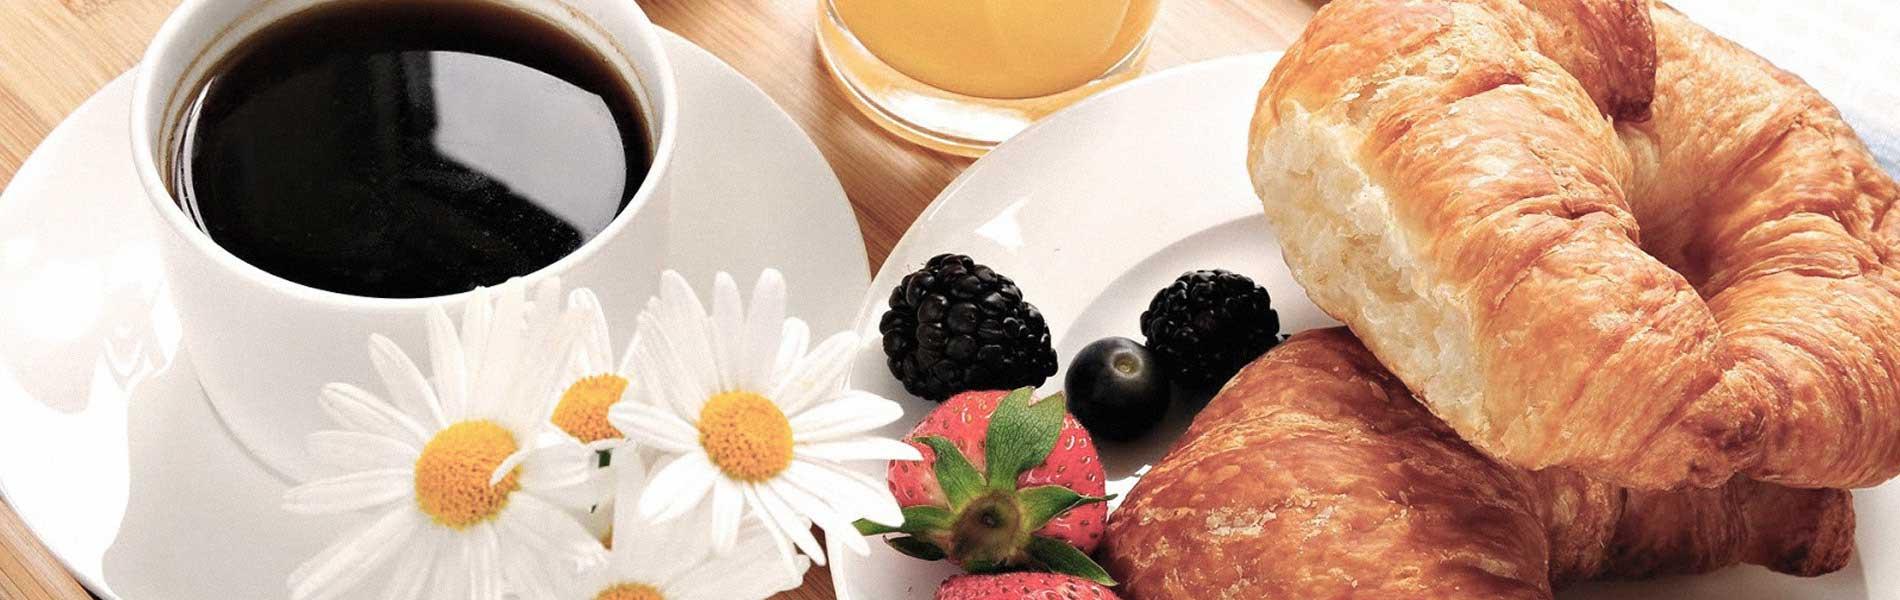 Principal Breakfast